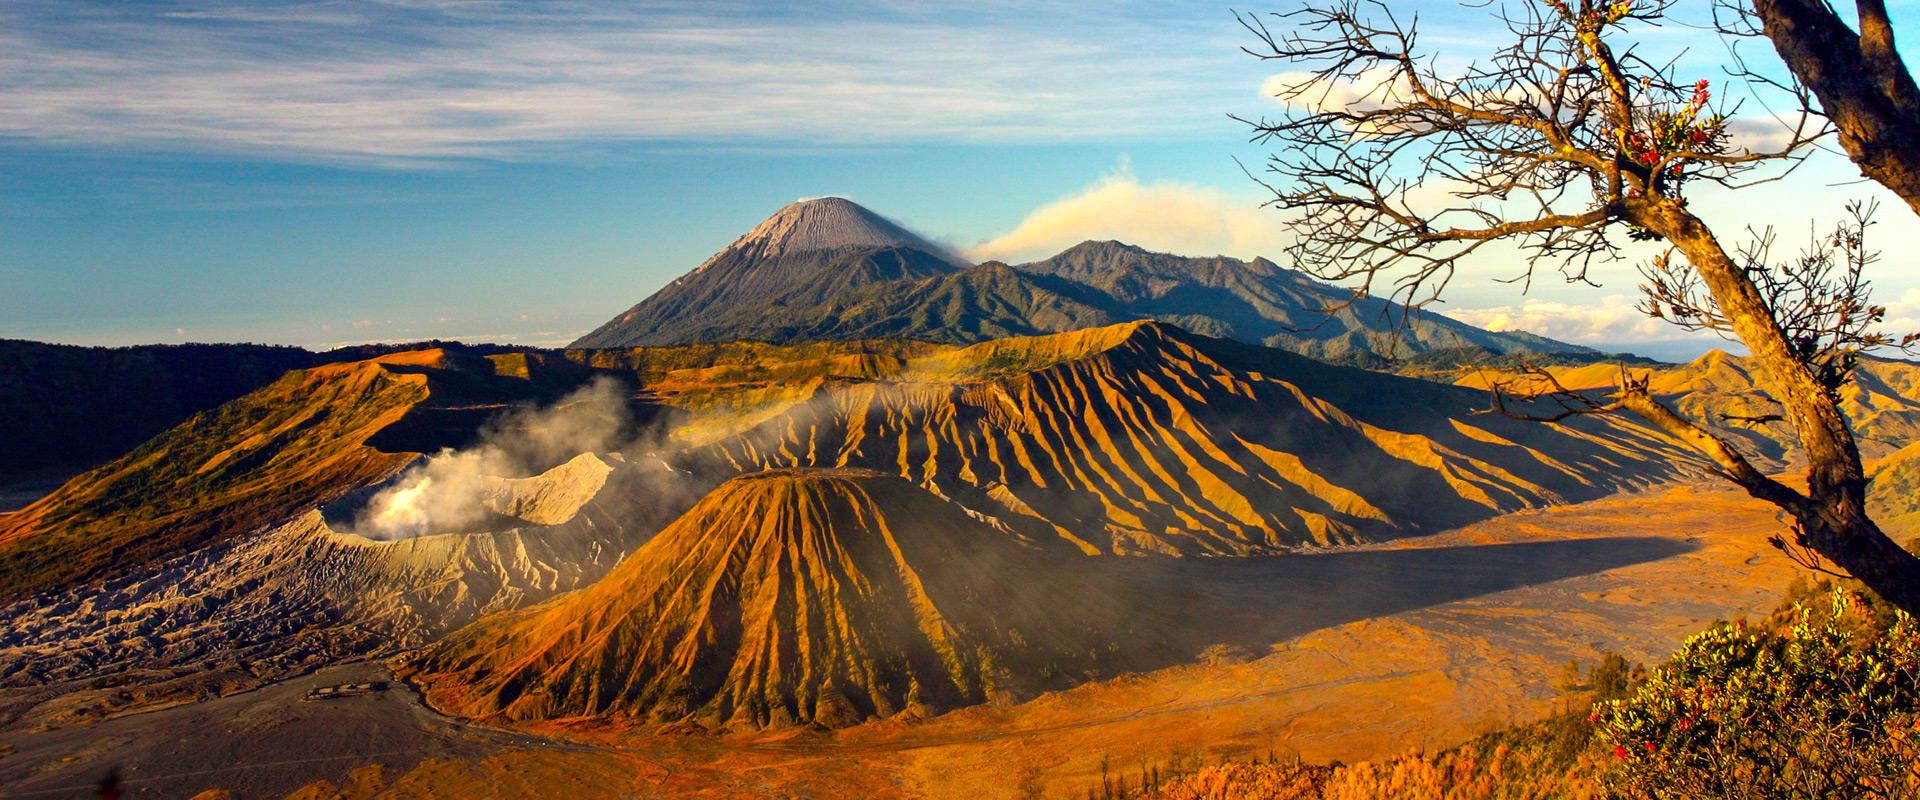 Indonesie2